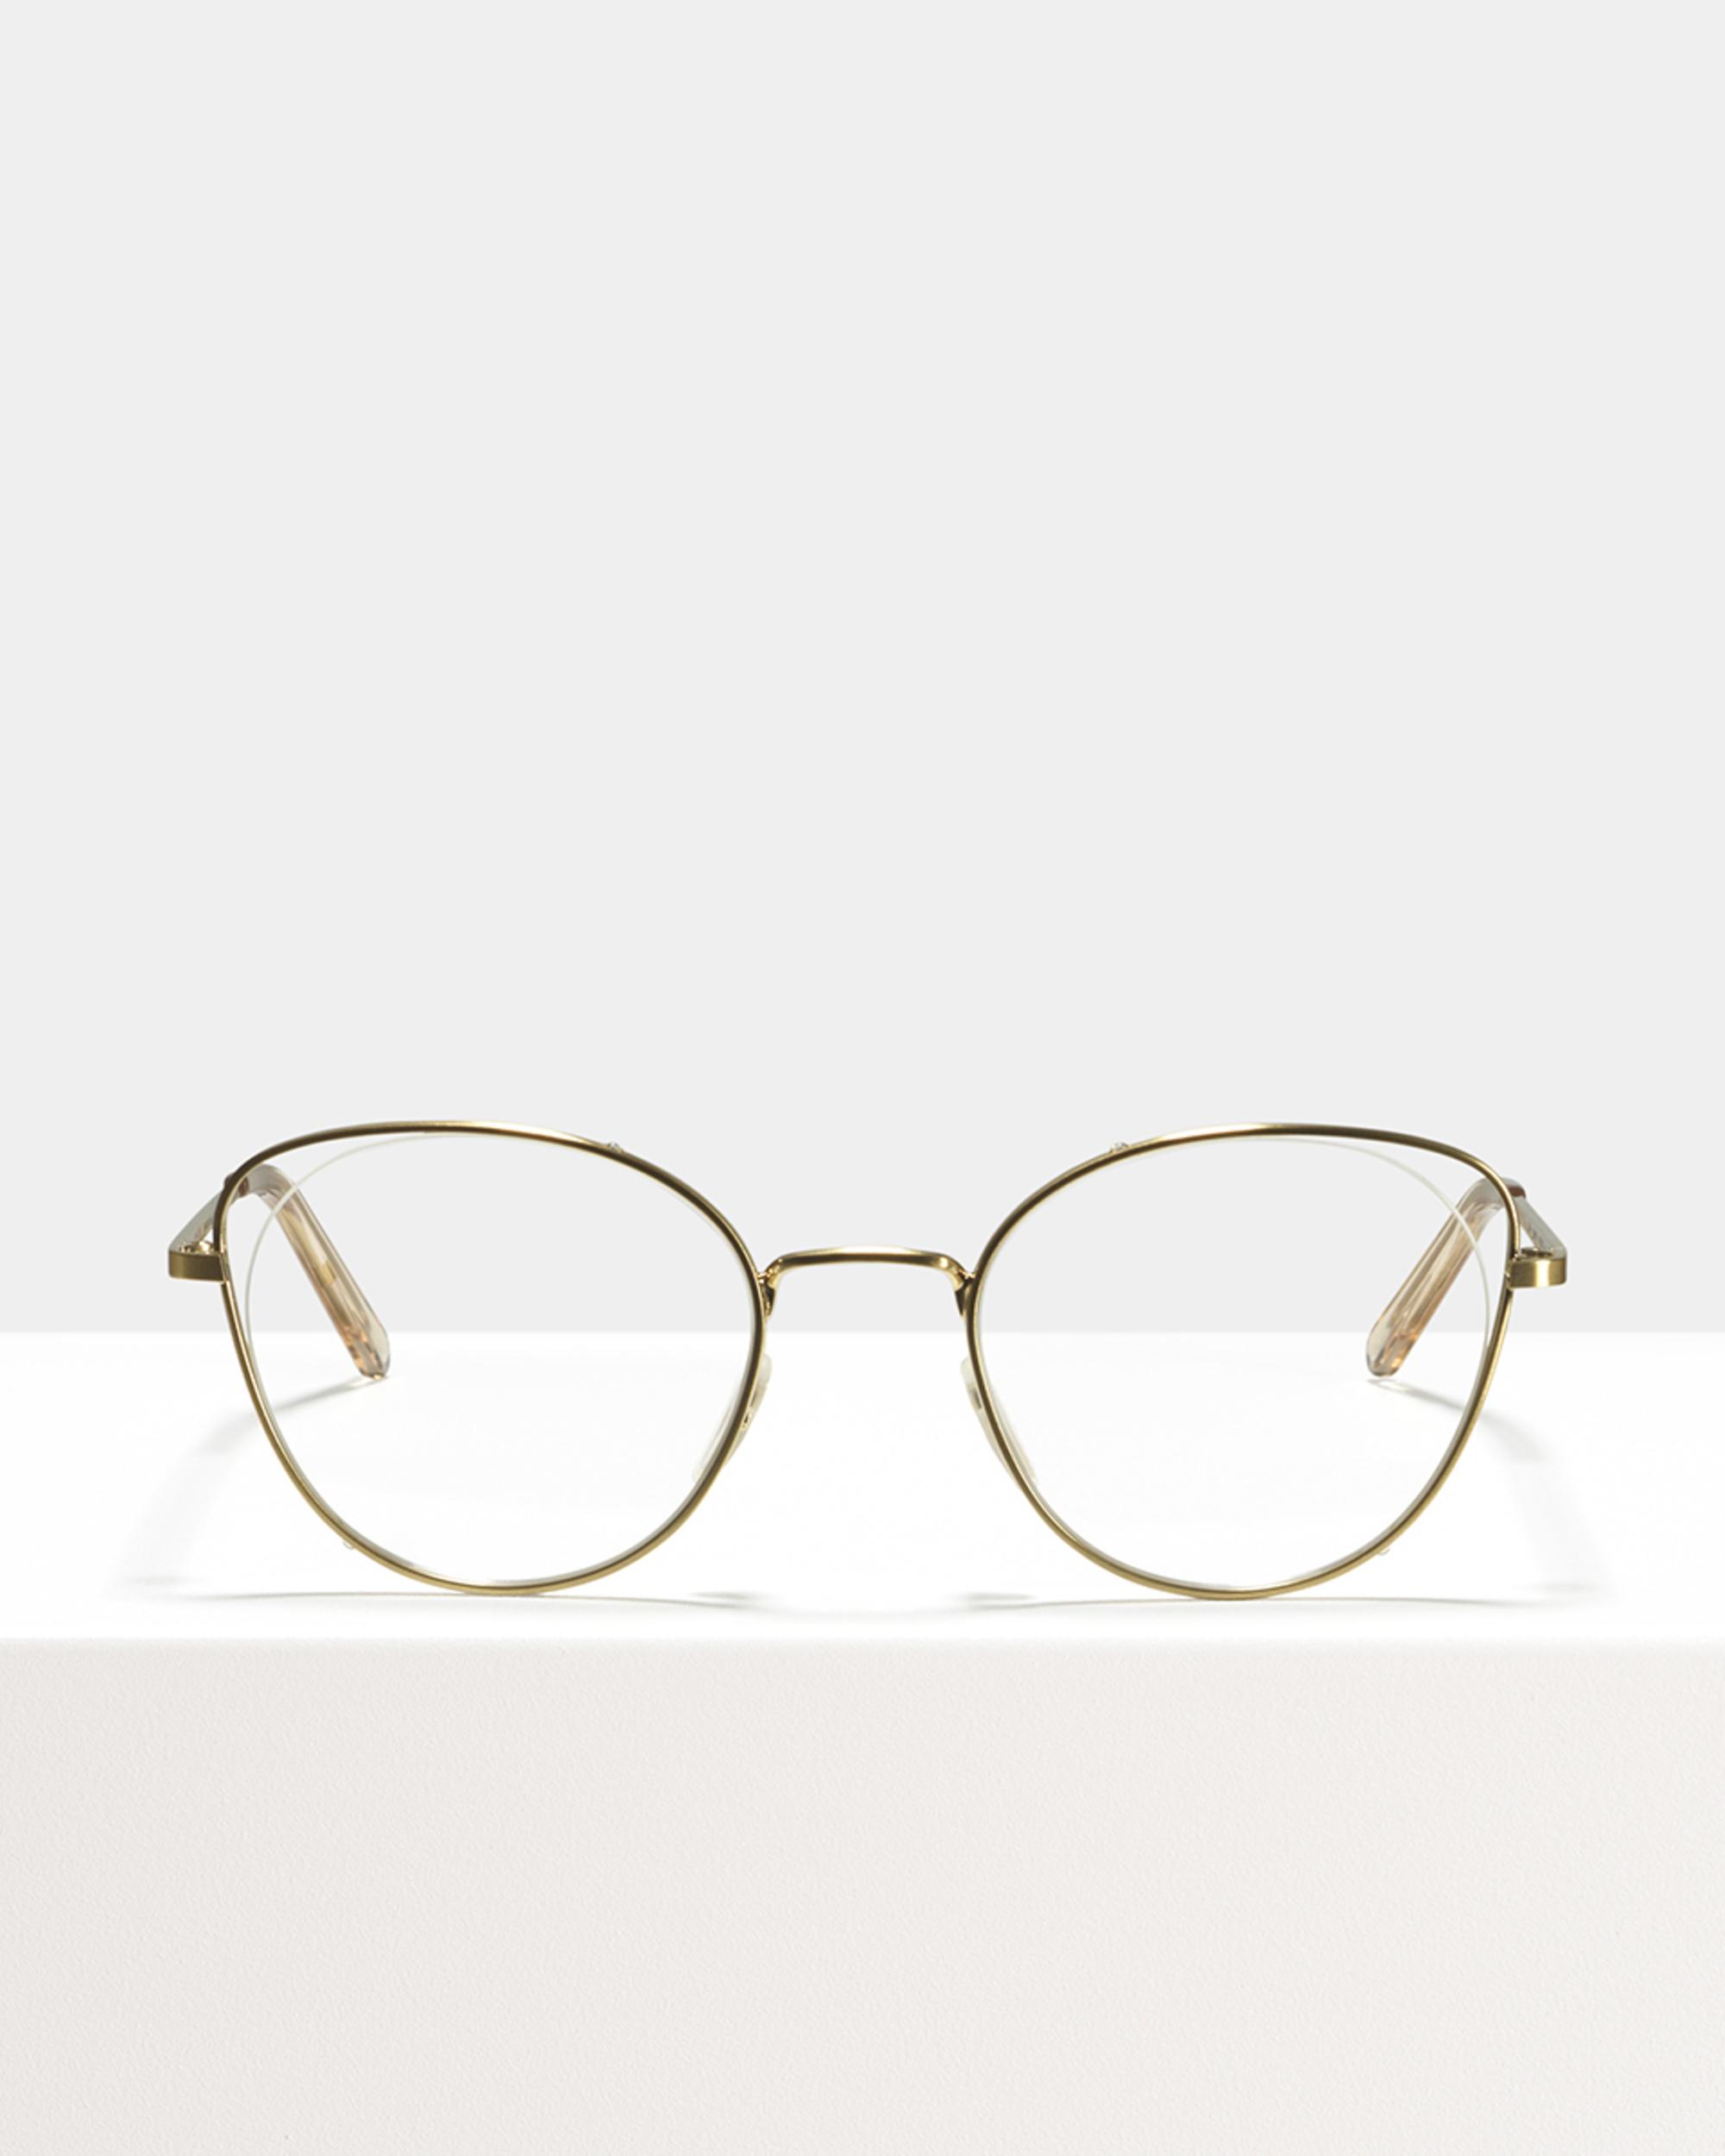 Ace & Tate Glasses | rond metaal in Goud